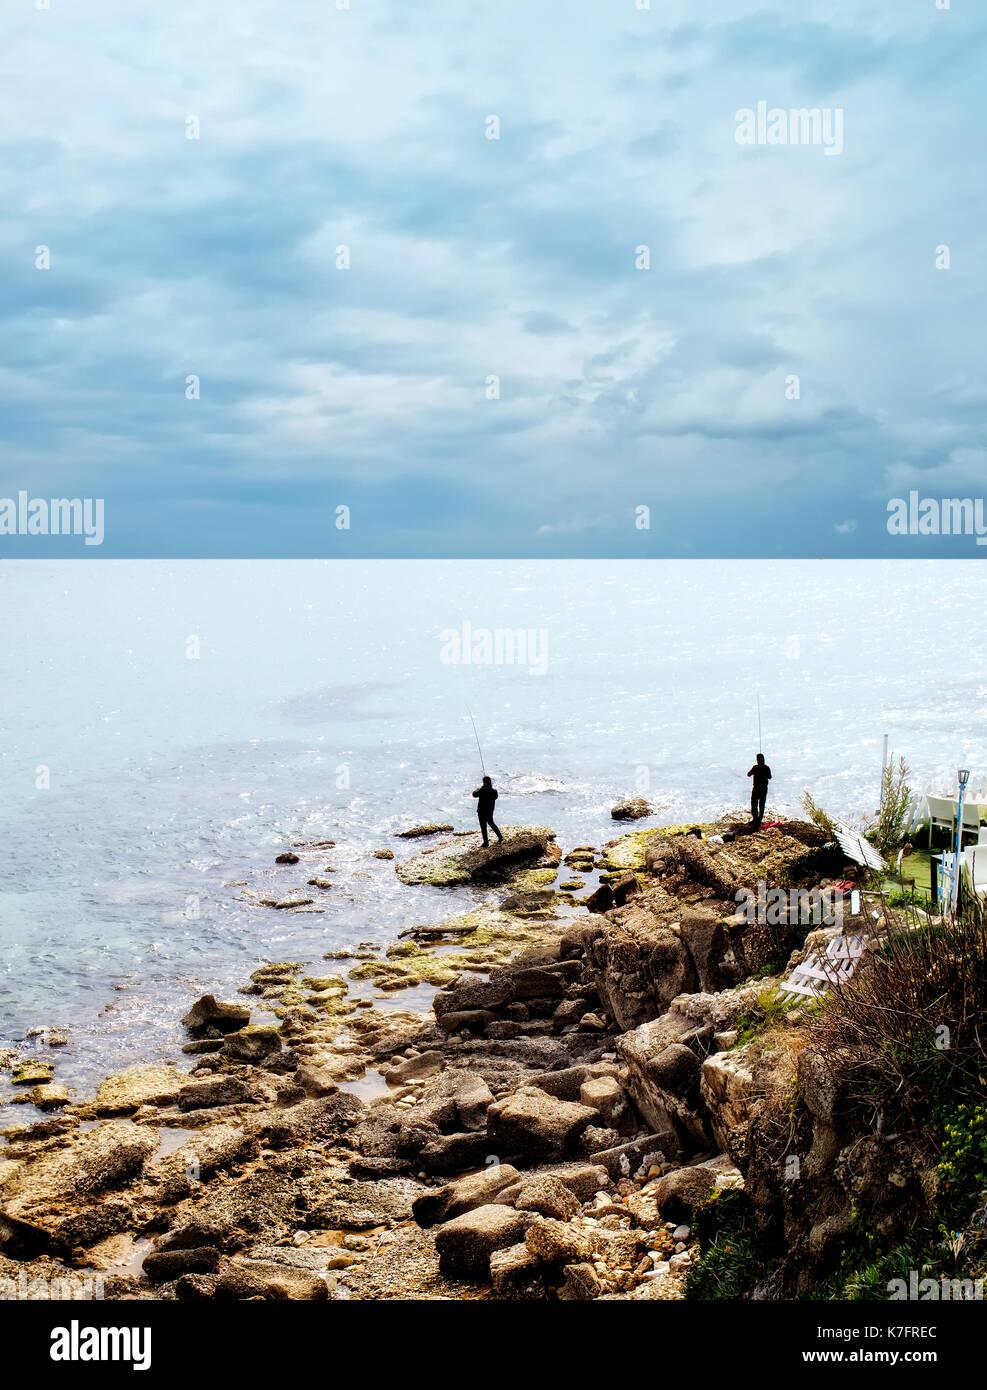 two fishermen sea fishing on rocky beach - Stock Image